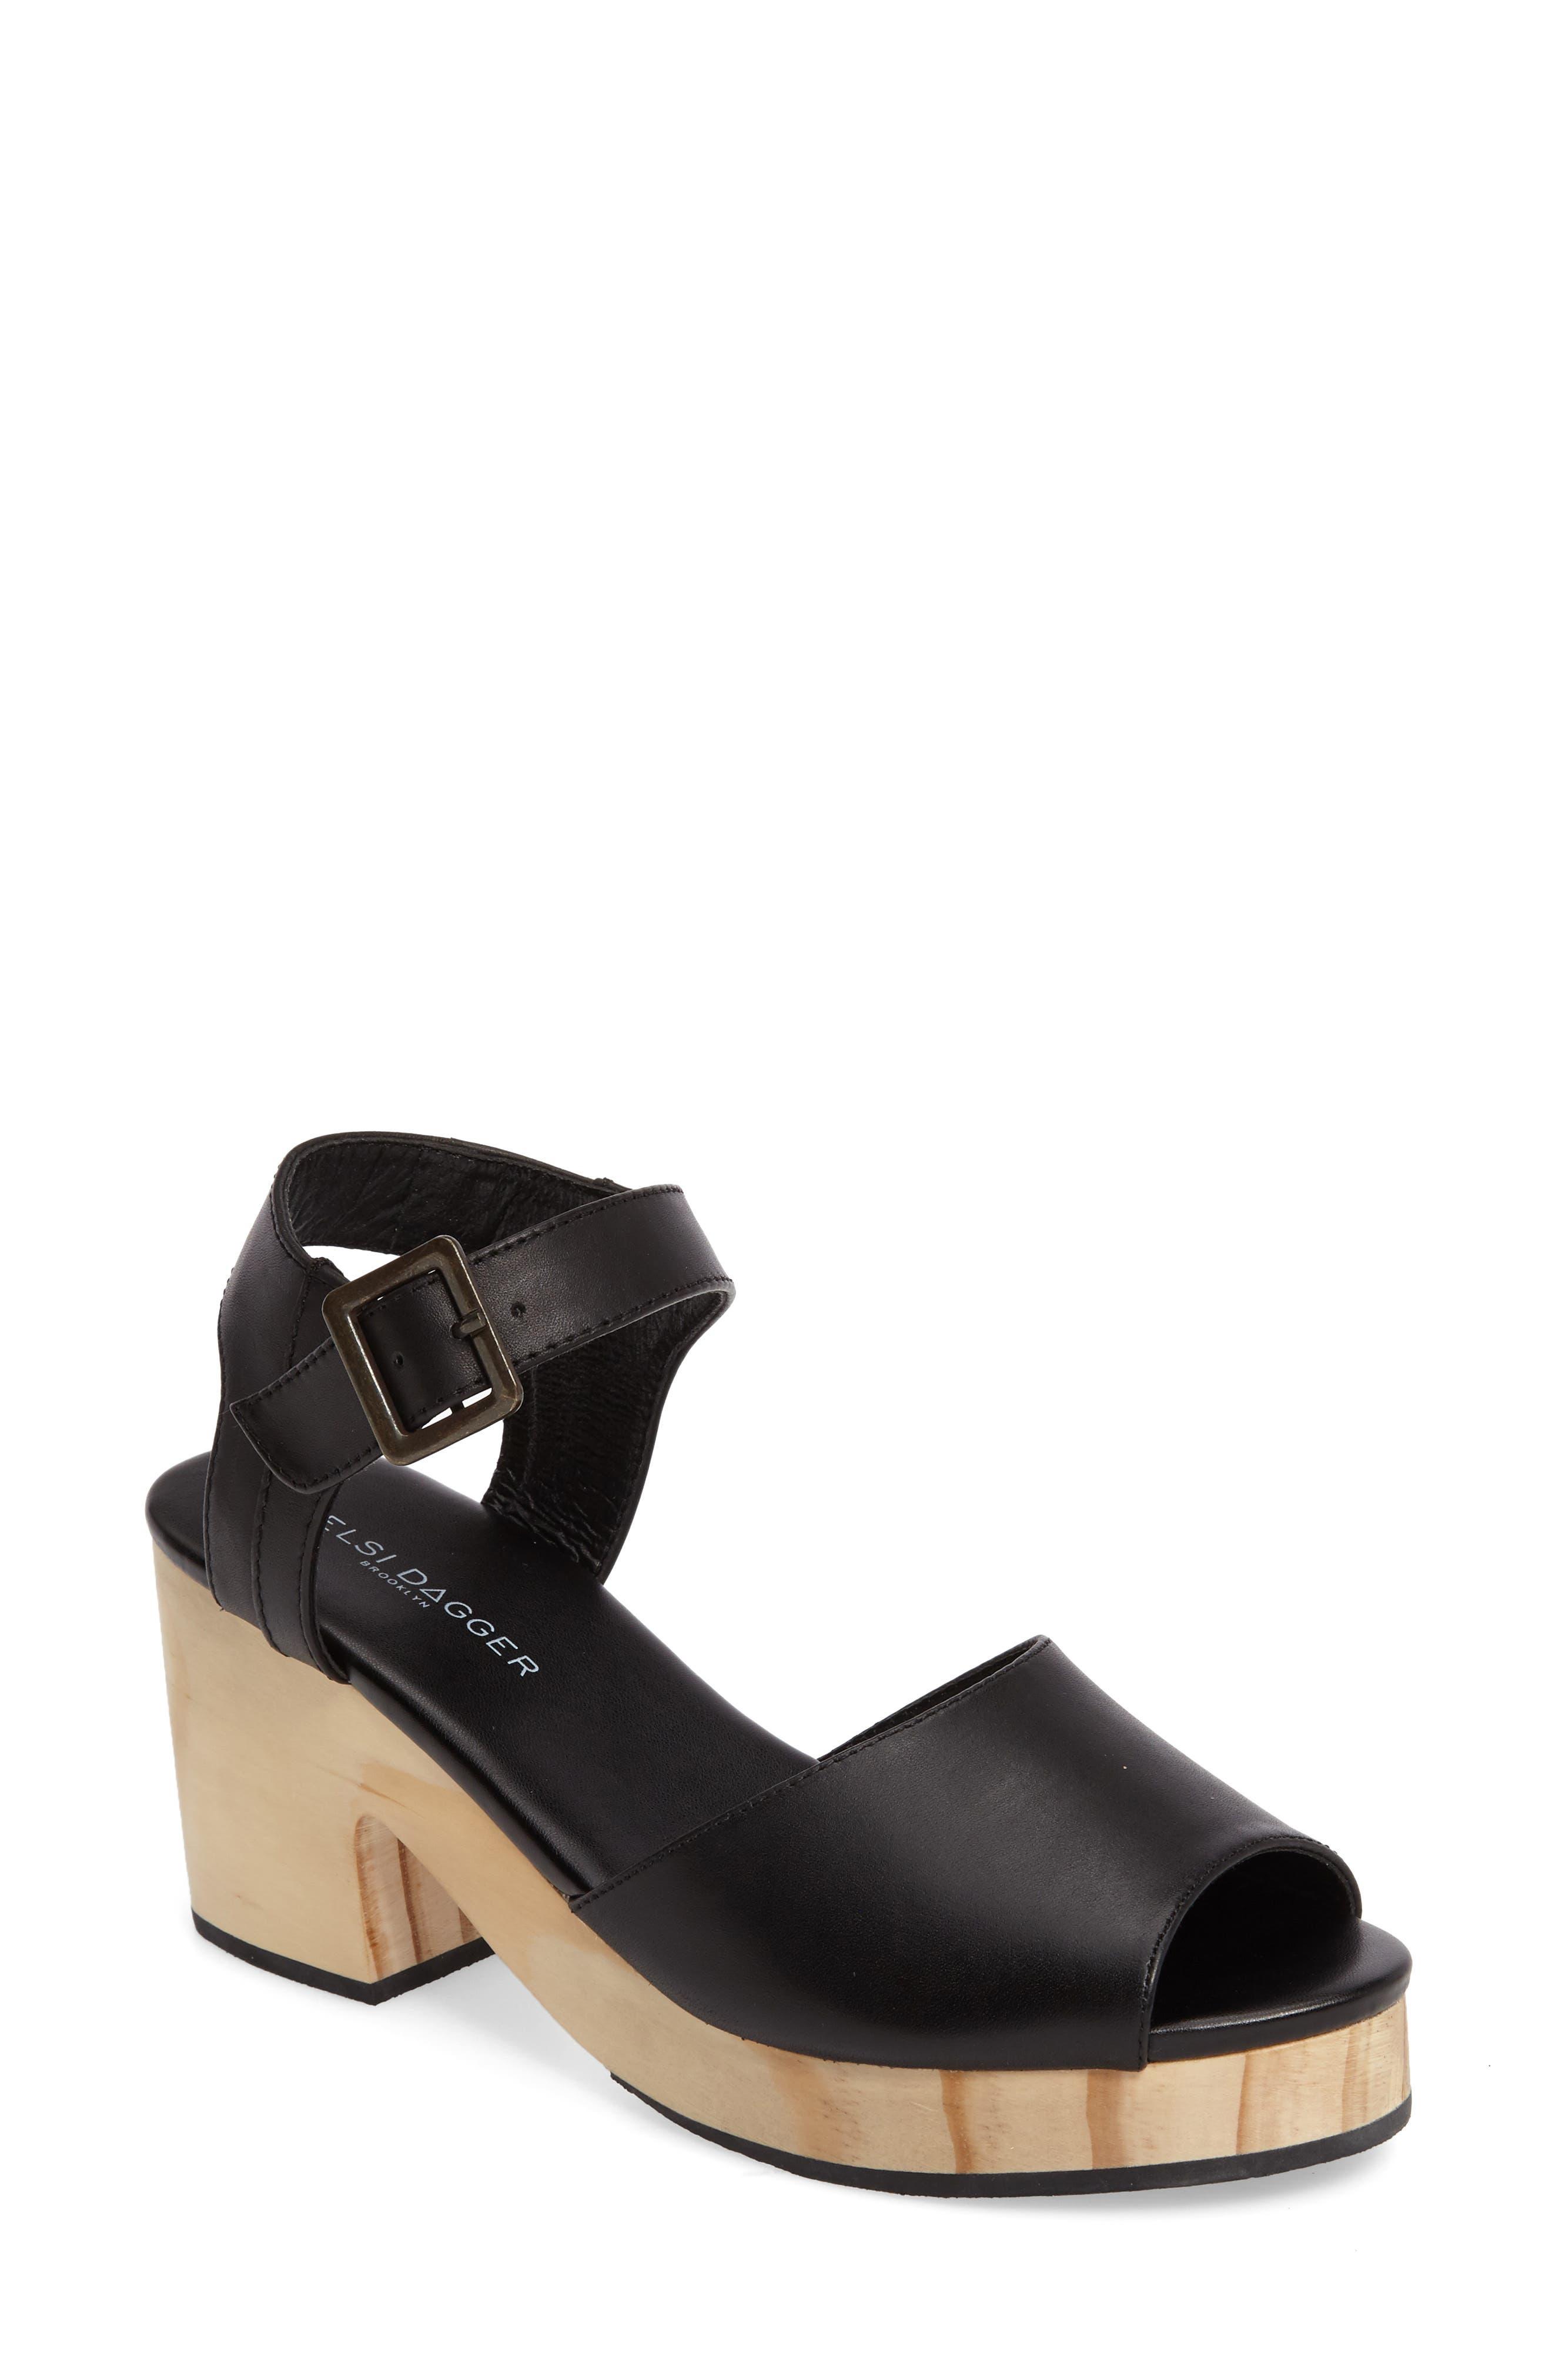 Montgomery Platform Sandal,                             Main thumbnail 1, color,                             Black Leather